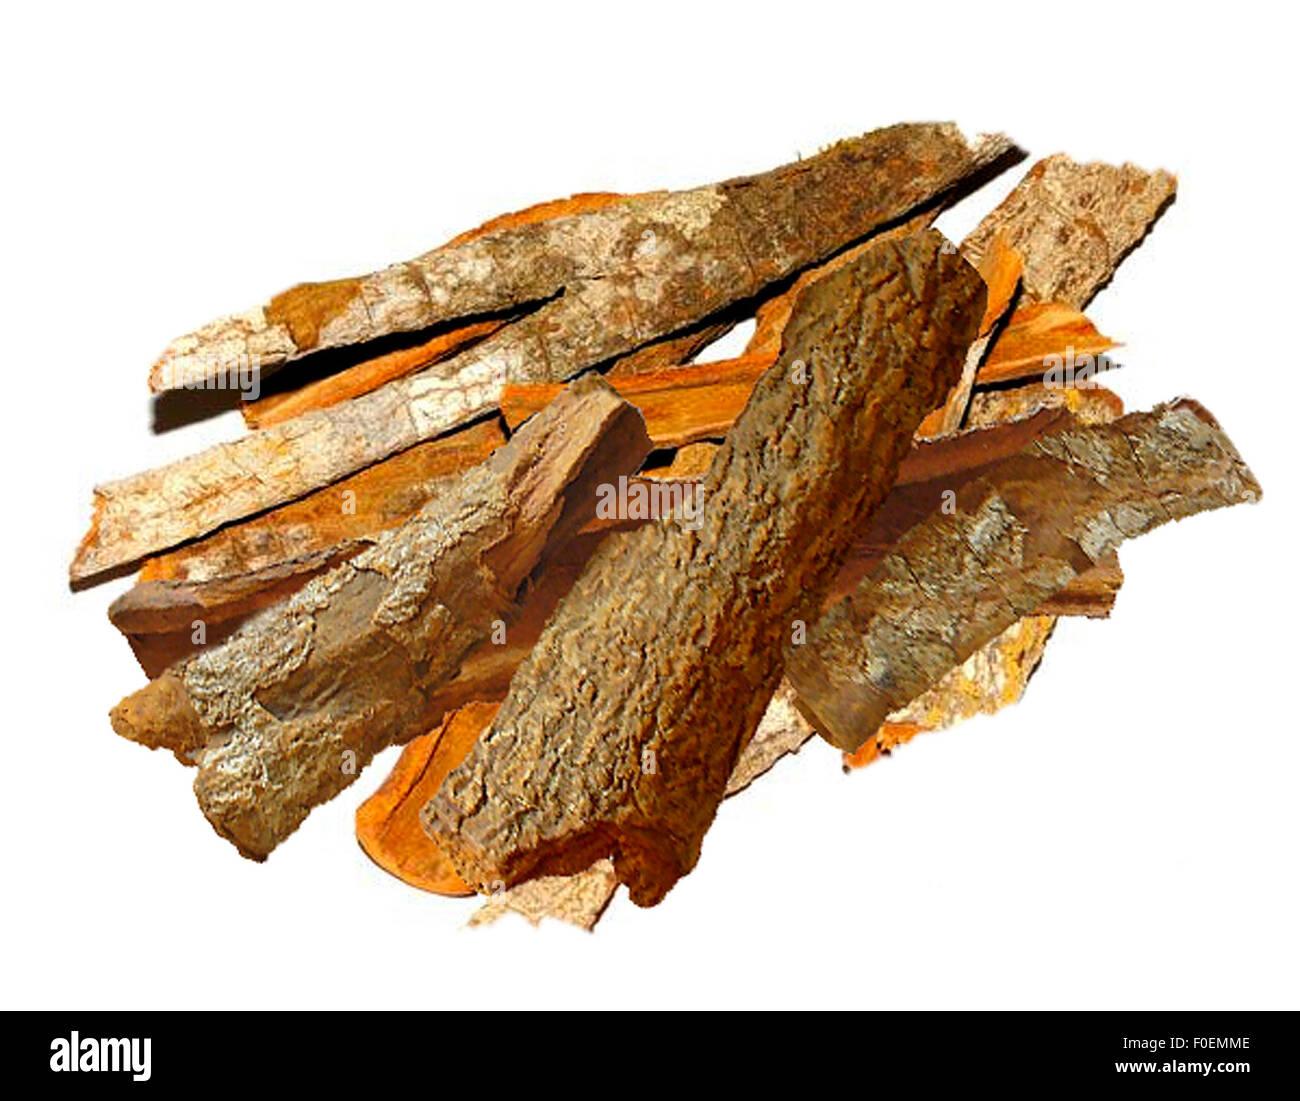 Chinin, Chinarinde, Malariamittel, Heilpflanzen, Immagini Stock